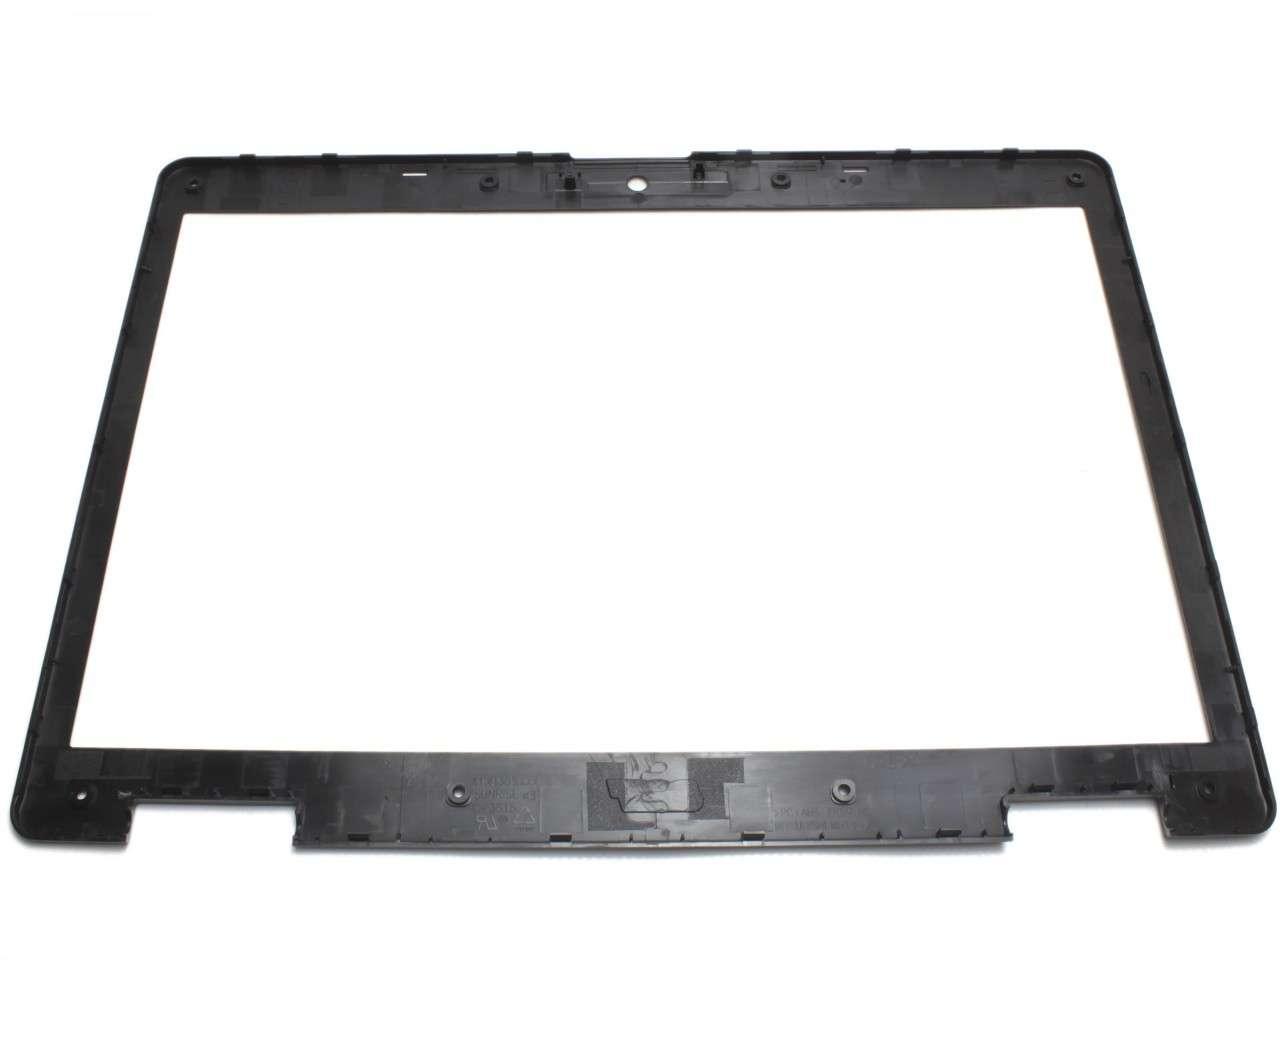 Rama Display Acer Extensa 5610 Bezel Front Cover Neagra imagine